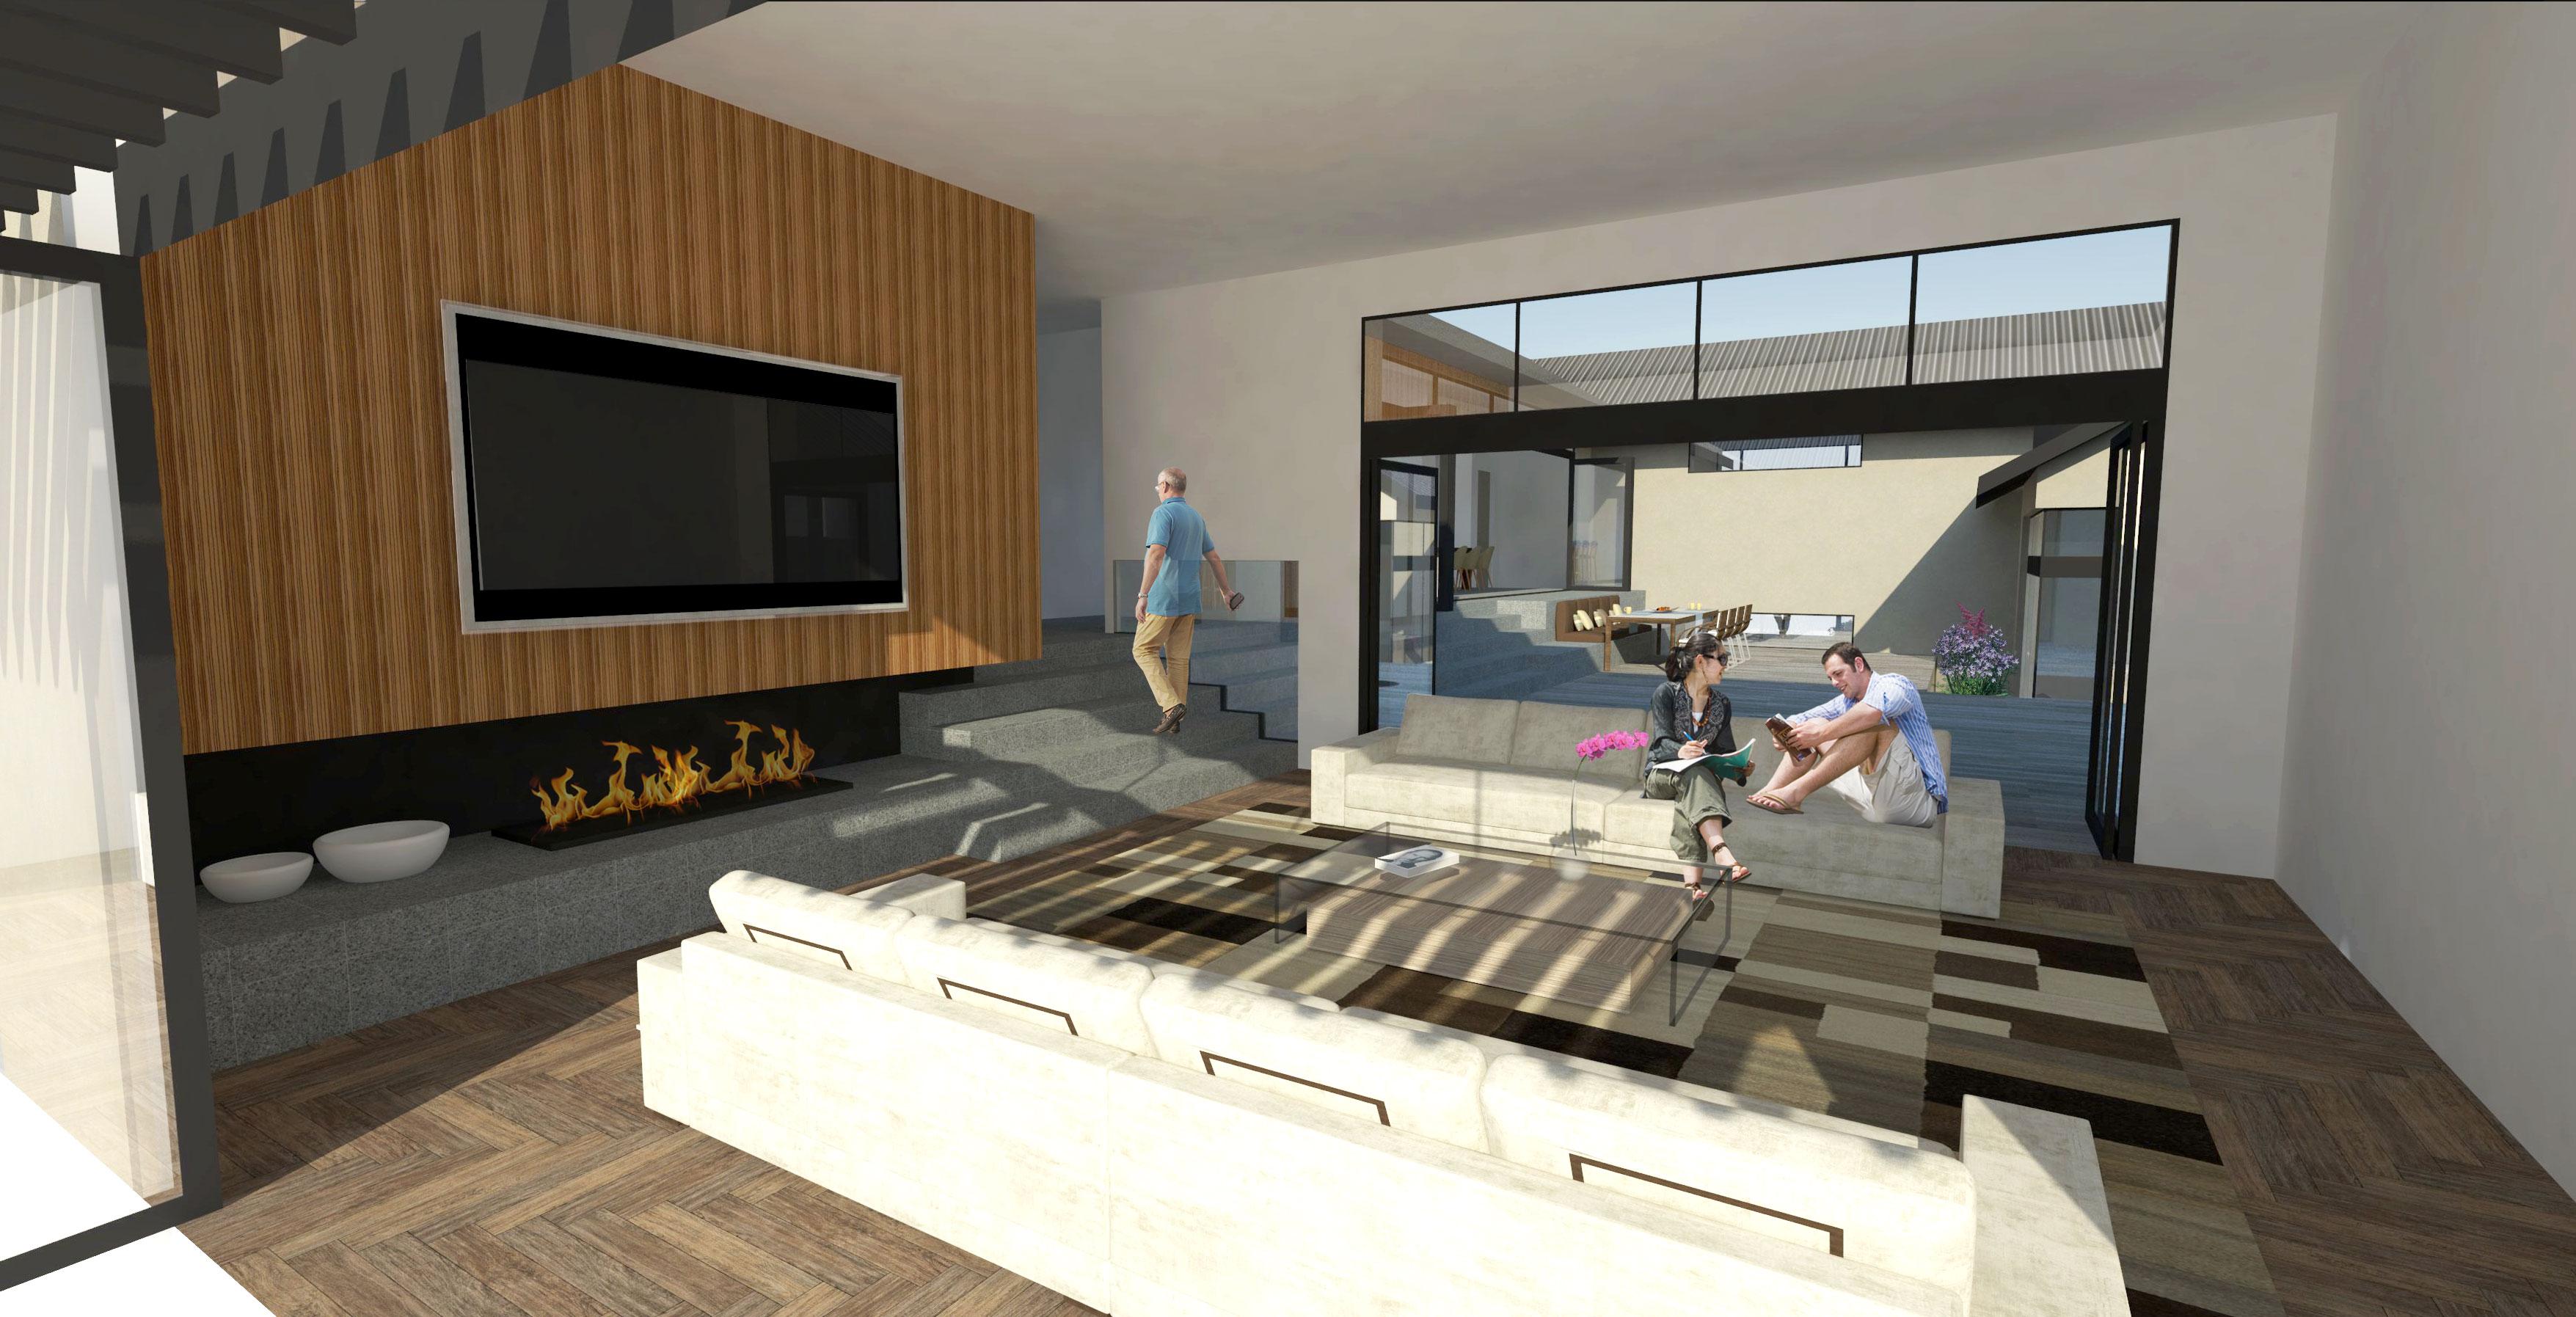 Norx, Lot 28, 17 Tau Rd, Flat Bush, 3D Render3